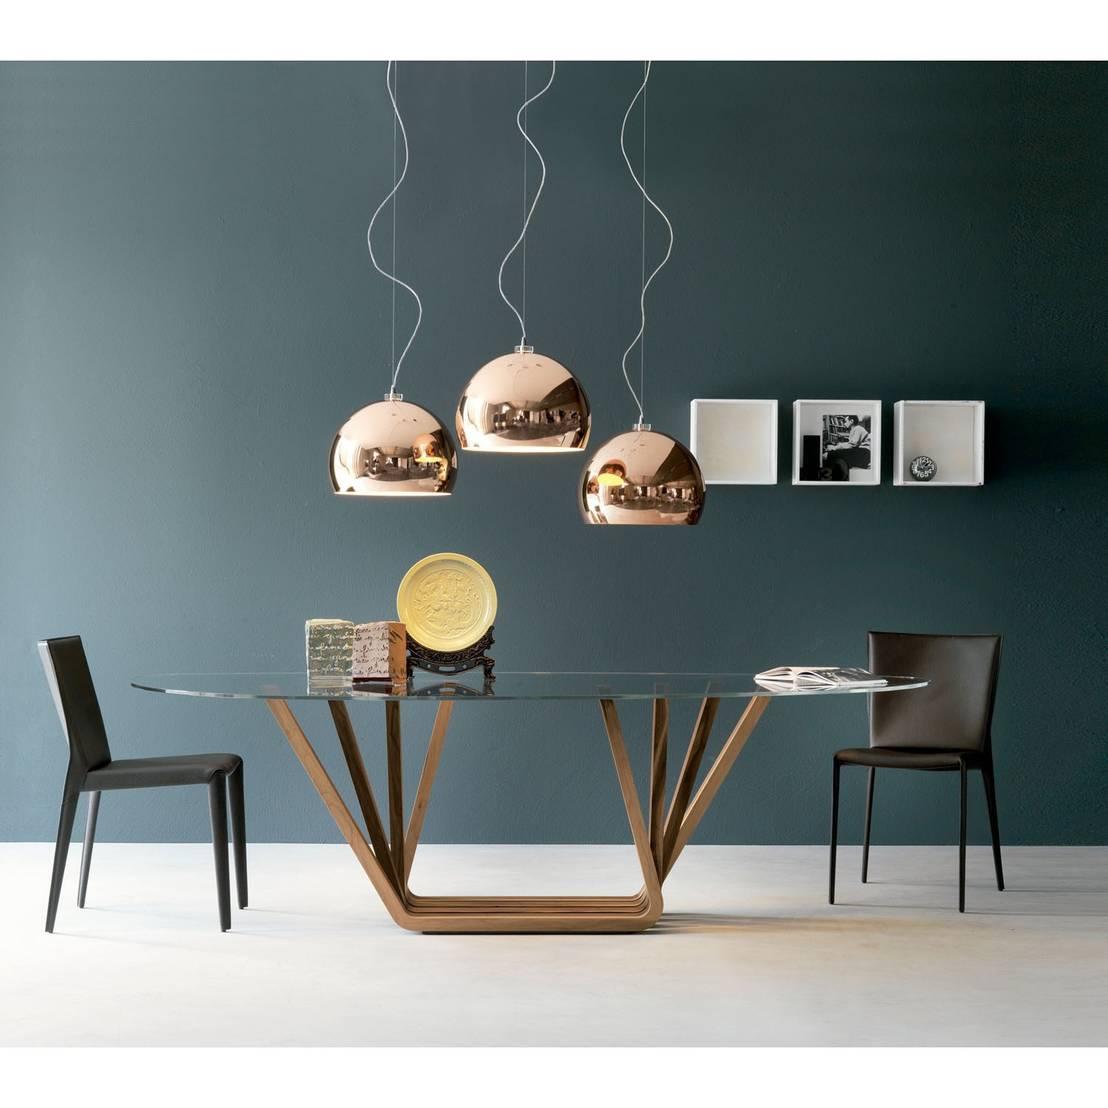 wie wende ich dunkle wandfarben an. Black Bedroom Furniture Sets. Home Design Ideas